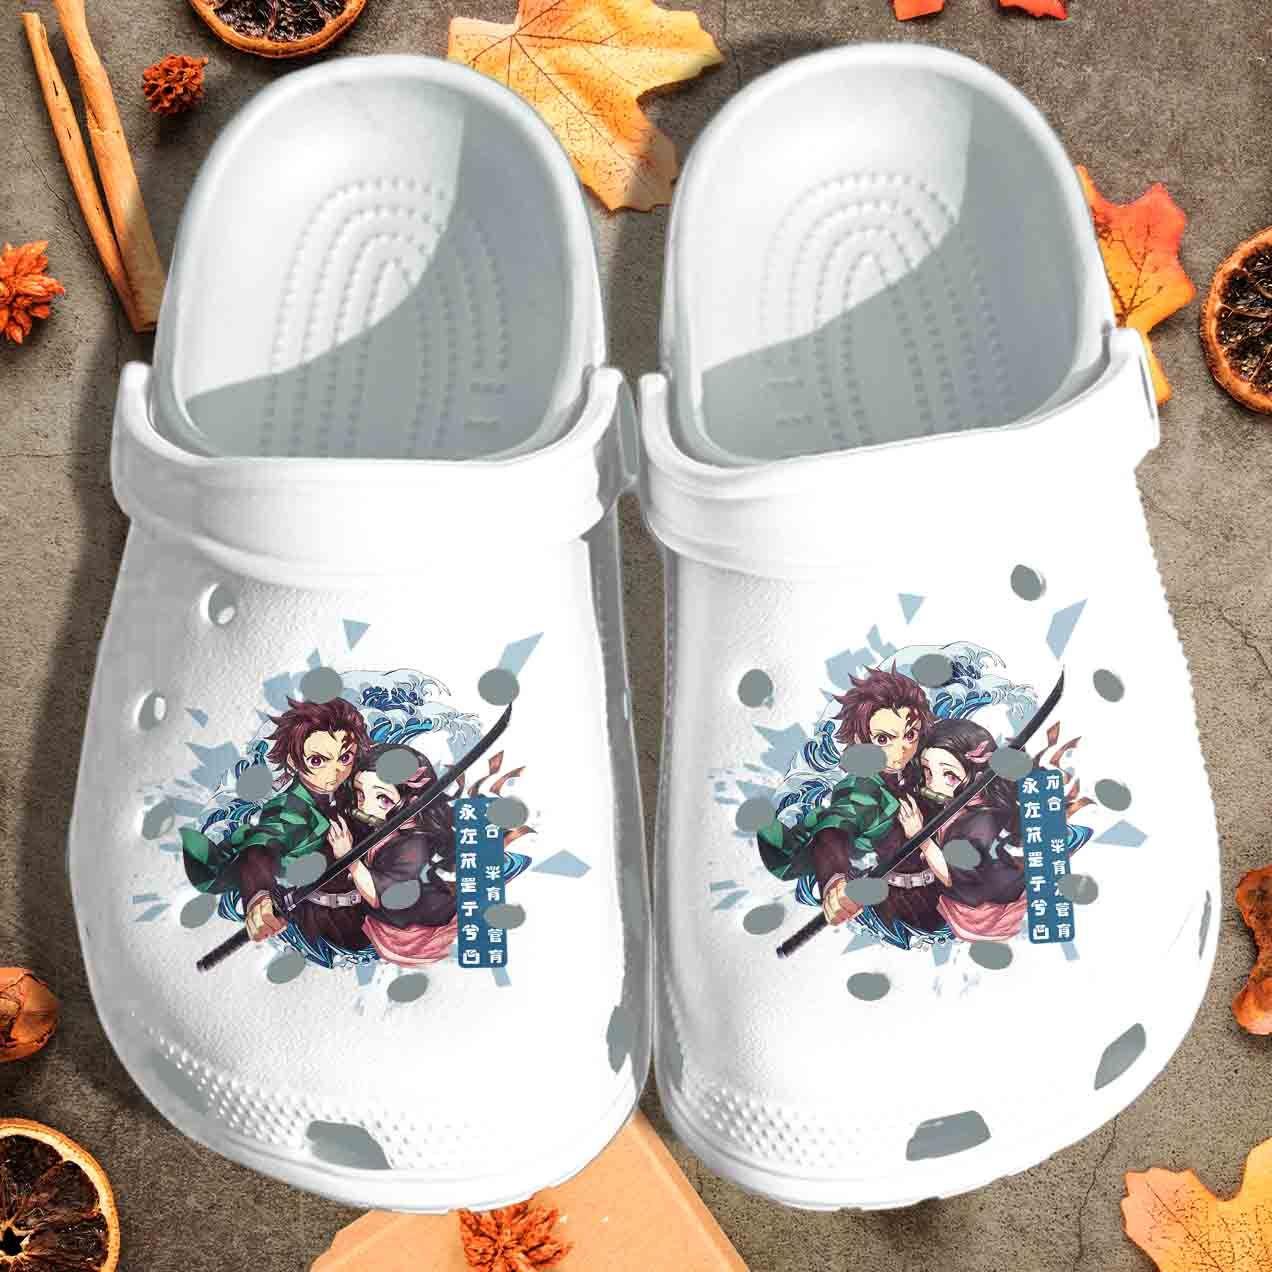 Photo of Slayers Demon Anime Manga Fan Art Crocs Shoes – Japanese Manga Crocs Clog Birthday Gift For Boy Girl